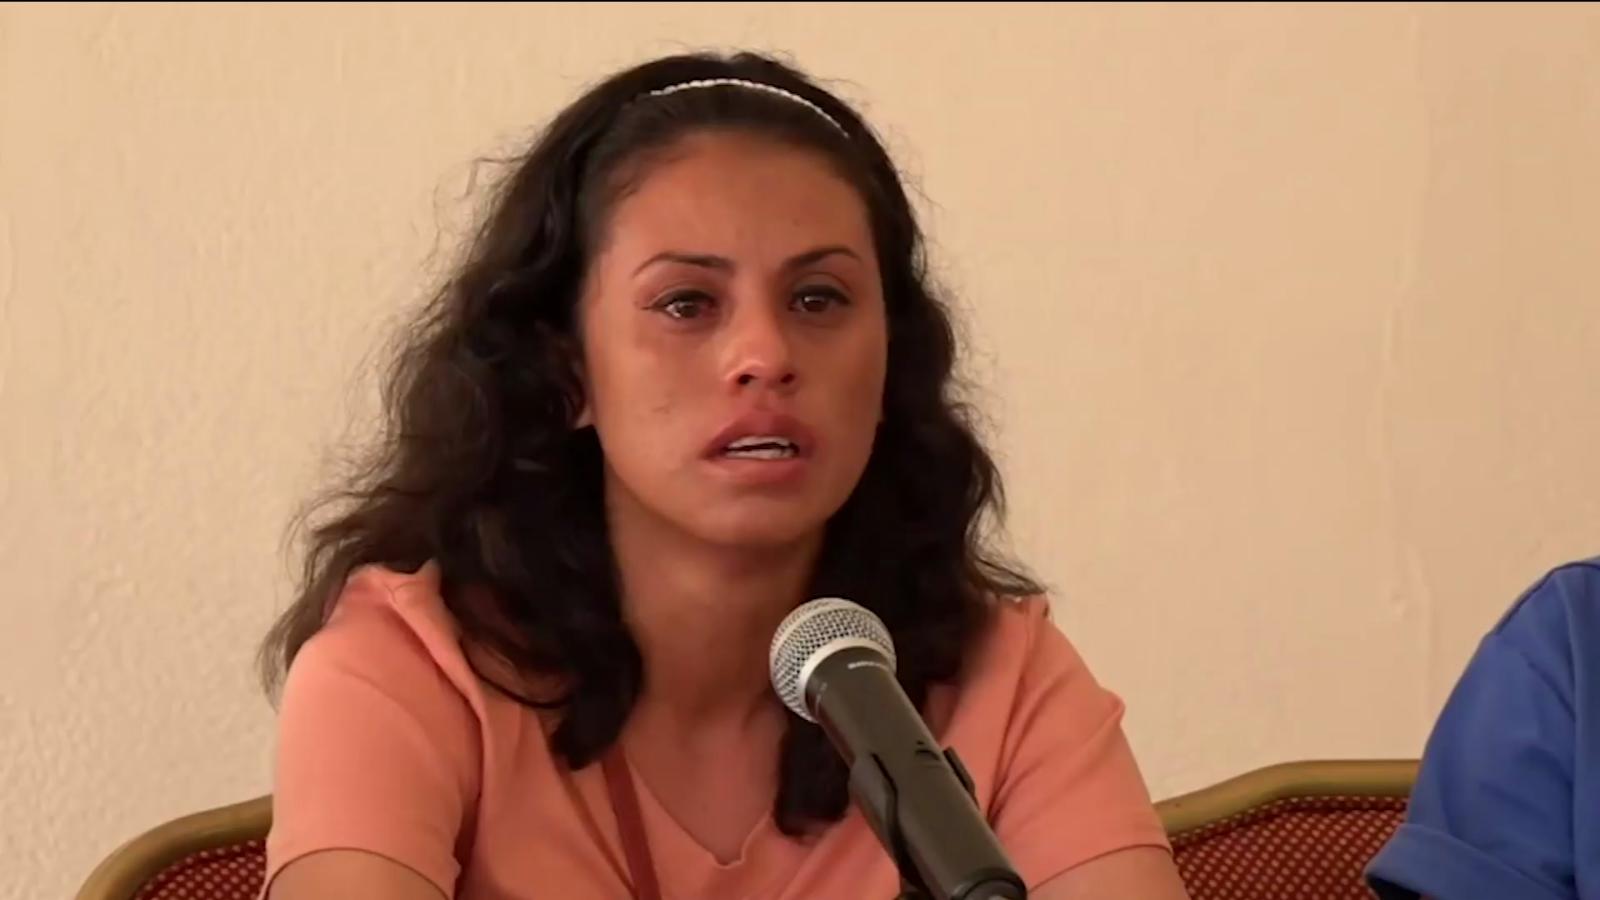 The case of Sara Rogel that set eyes on abortion in El Salvador